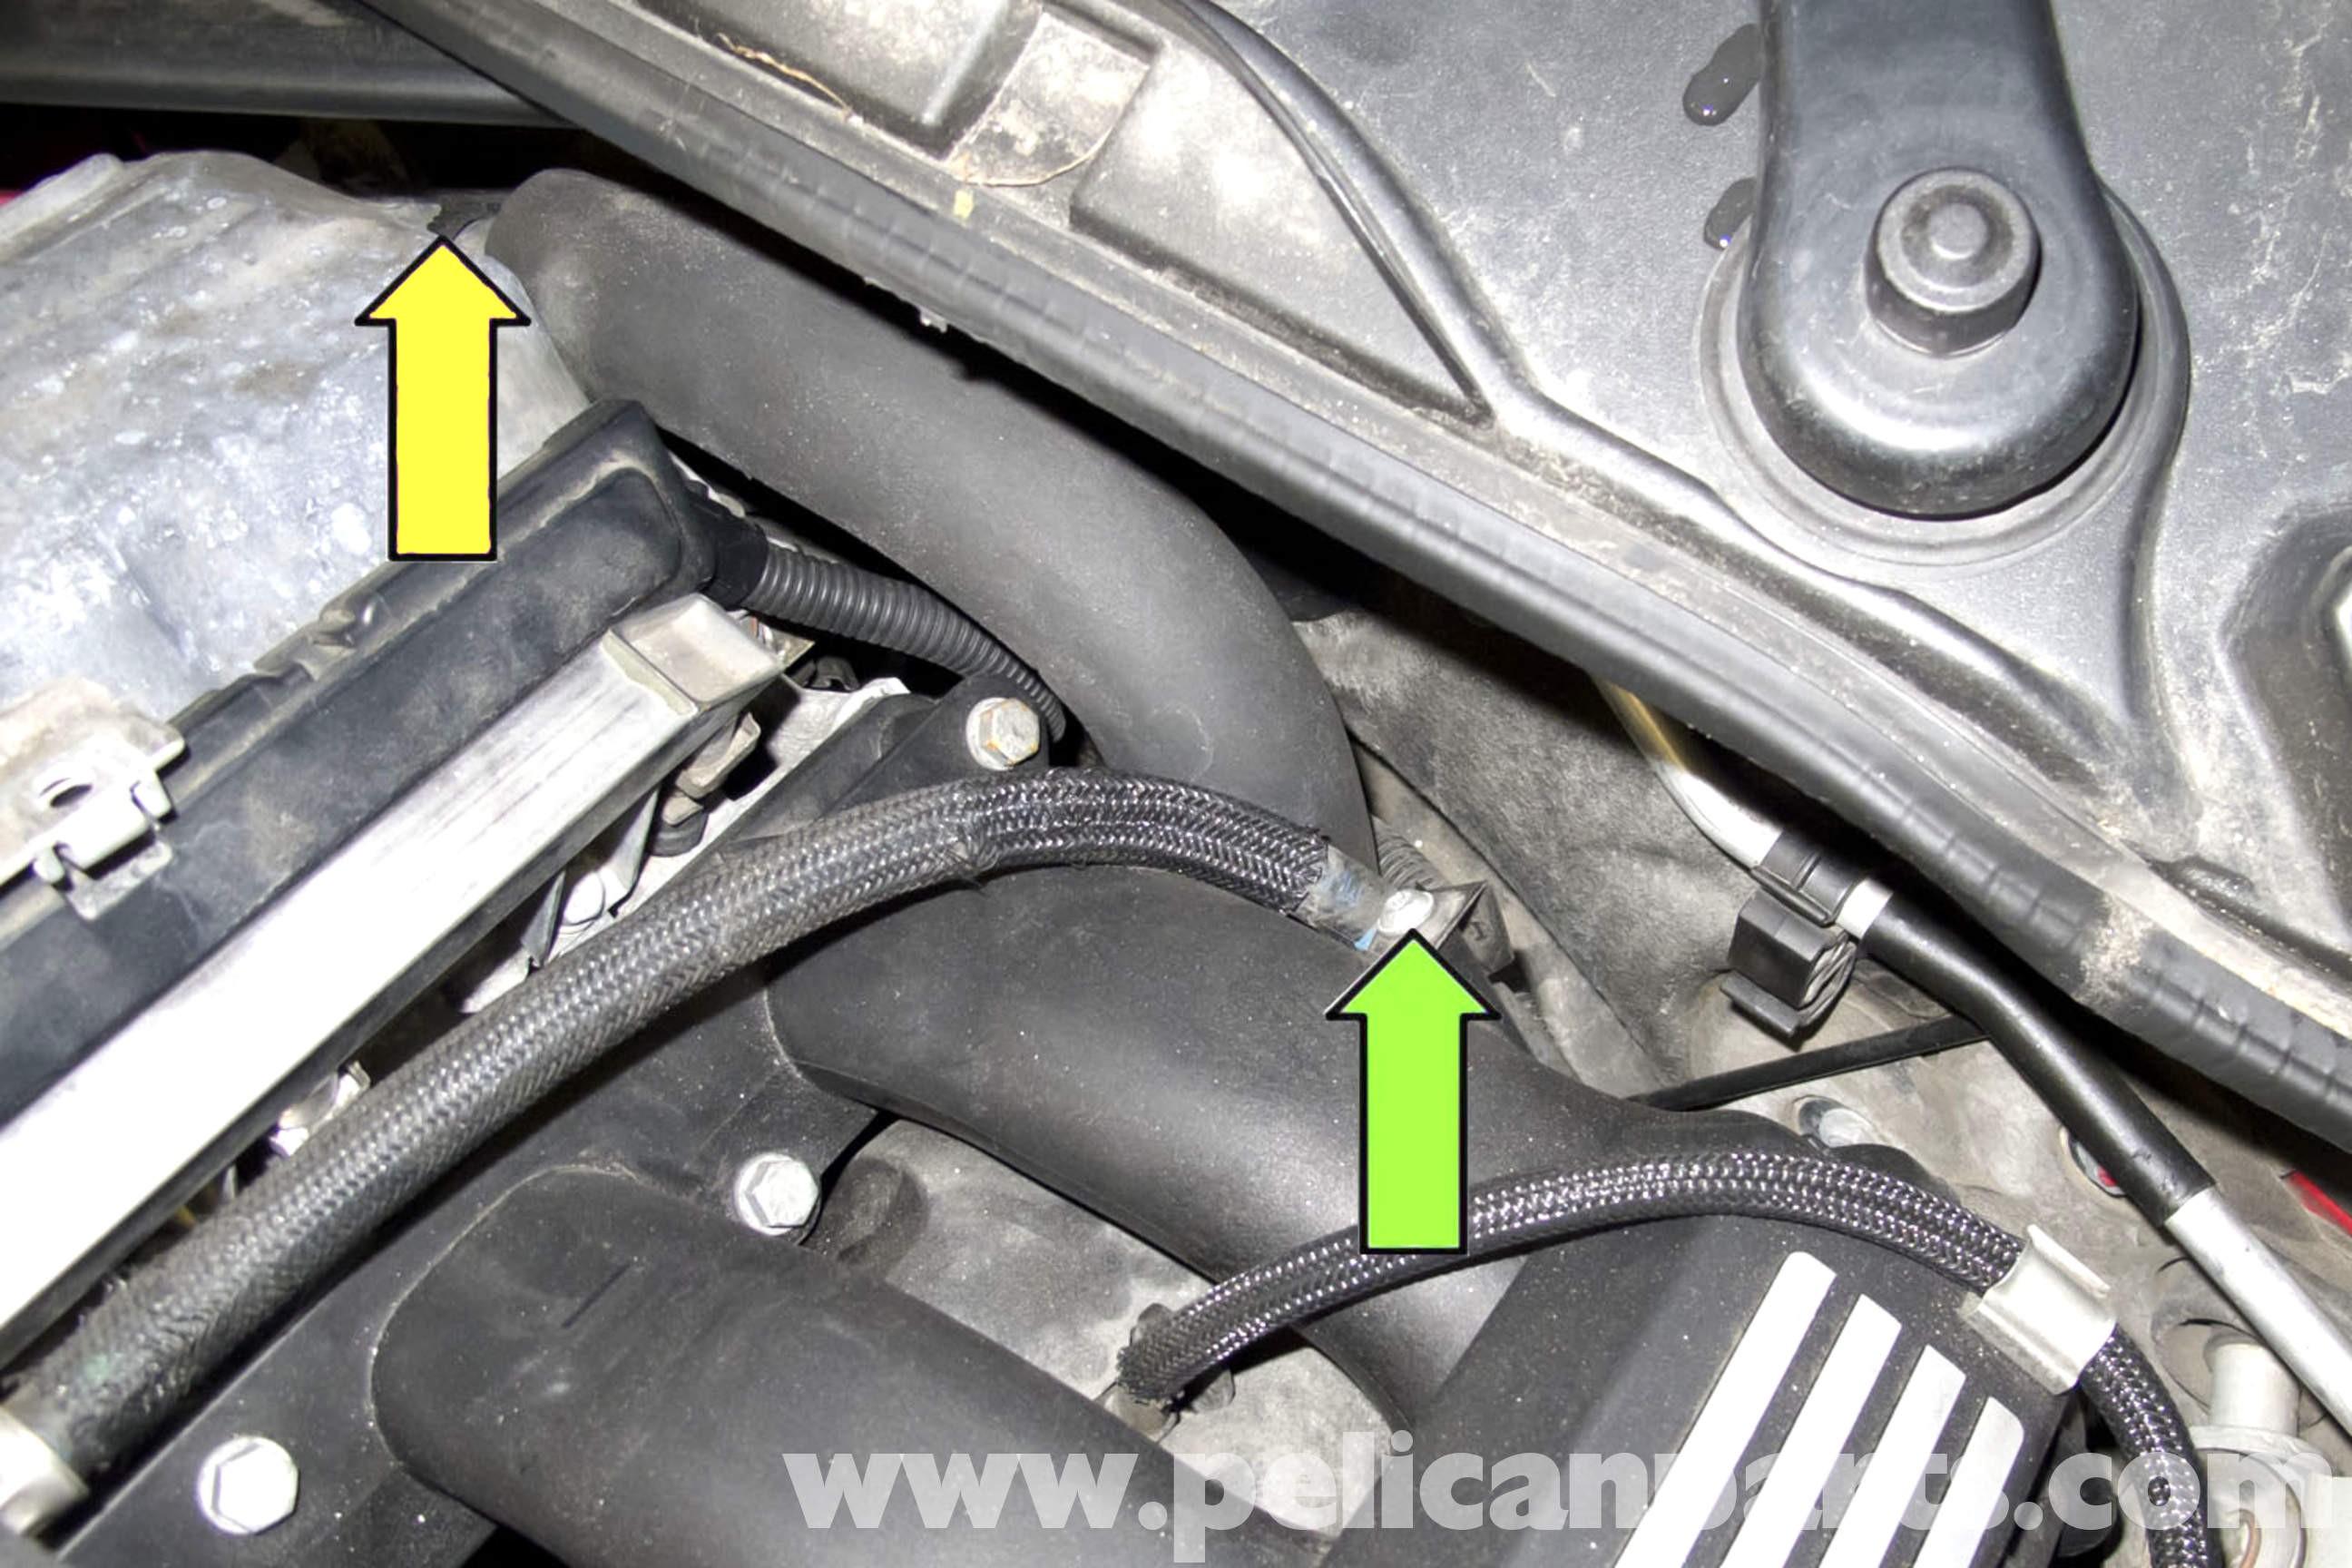 2000 Bmw 328i Engine Diagram Bmw E90 Intake Manifold Replacement E91 E92 E93 Of 2000 Bmw 328i Engine Diagram